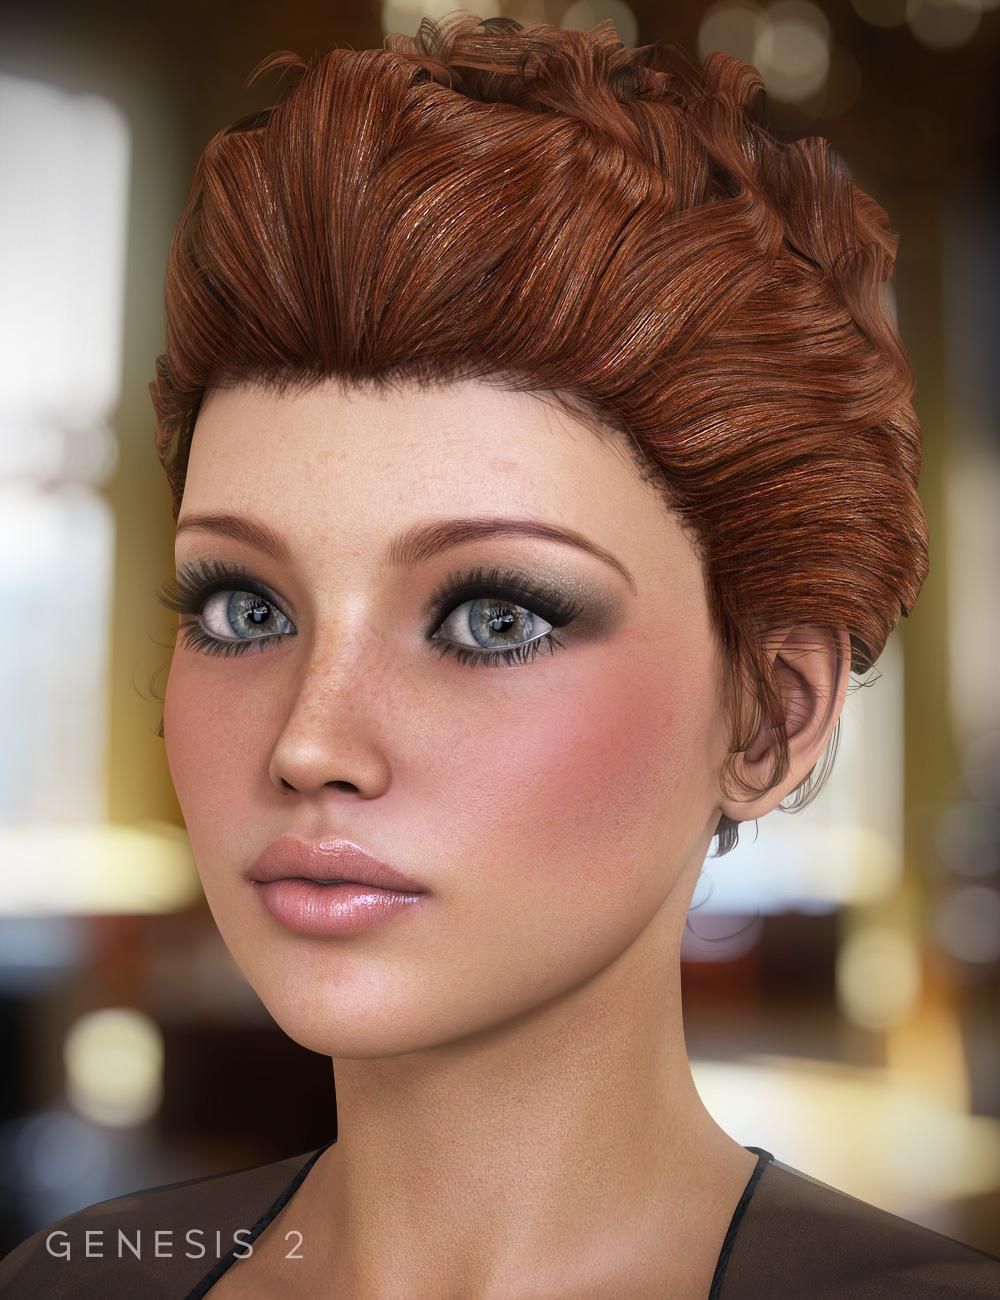 Sultry Hair for Genesis and Genesis 2 Females by: goldtassel, 3D Models by Daz 3D